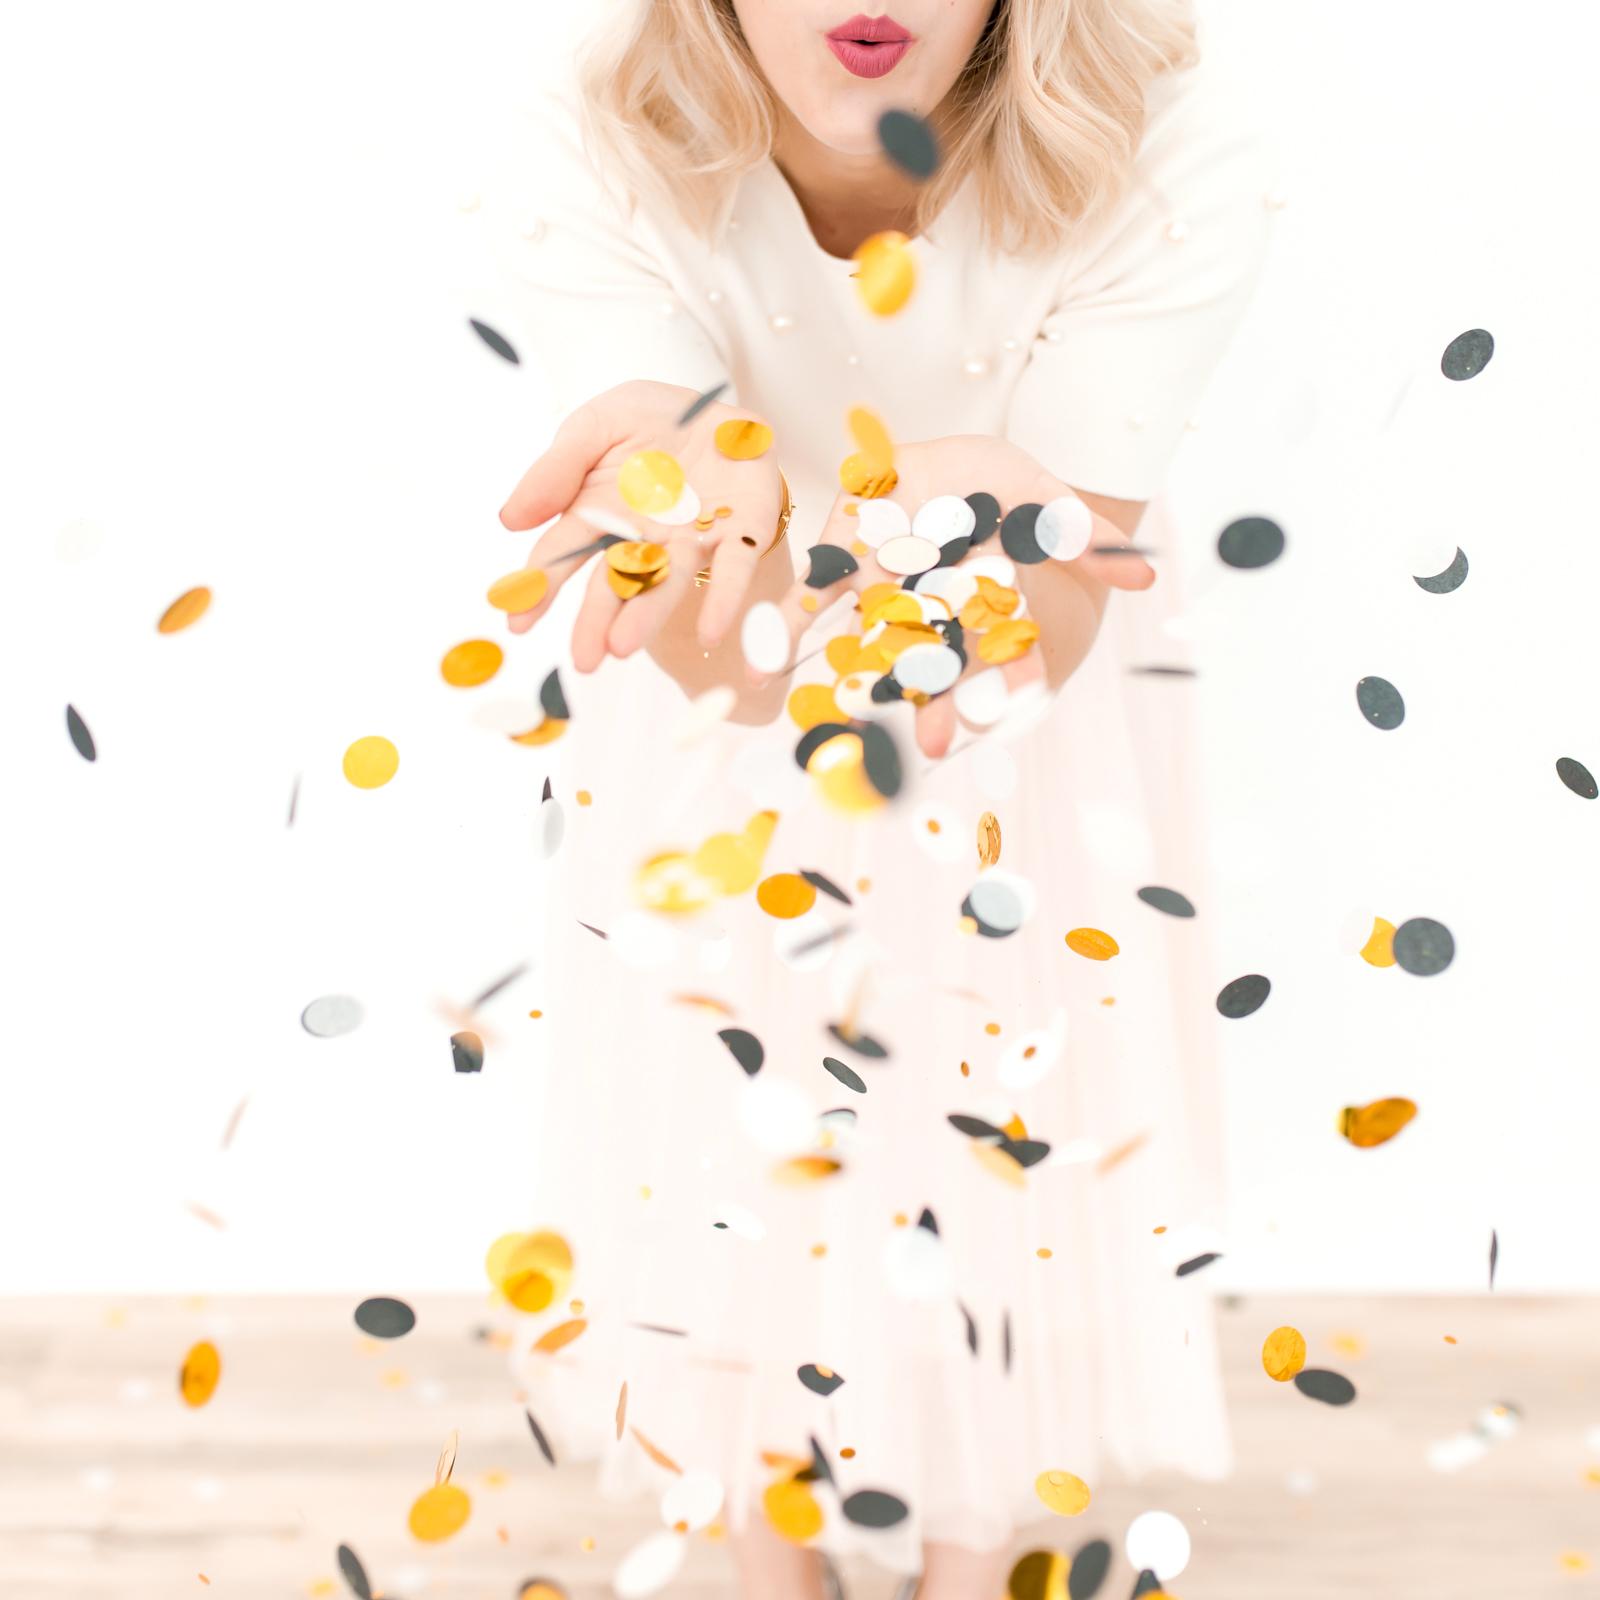 haute-stock-photography-pop-the-pink-final-25.jpg